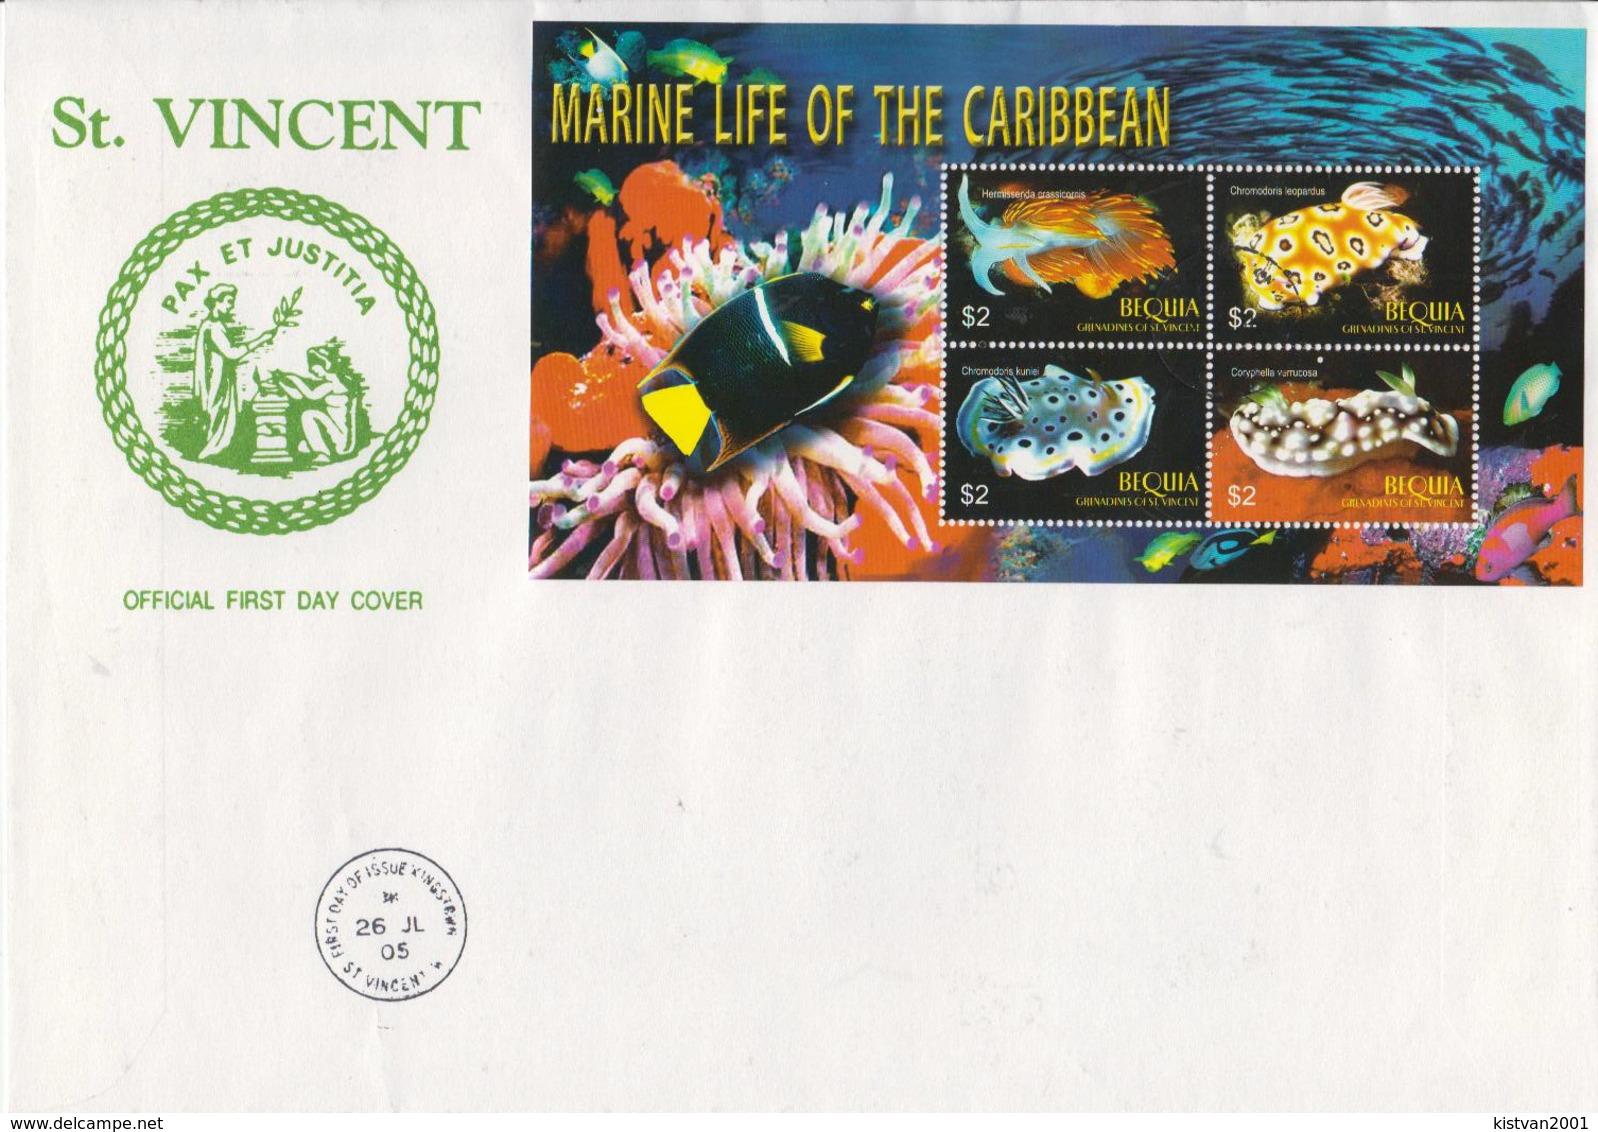 Bequya Marine Life Sheetlet On FDC - Maritiem Leven